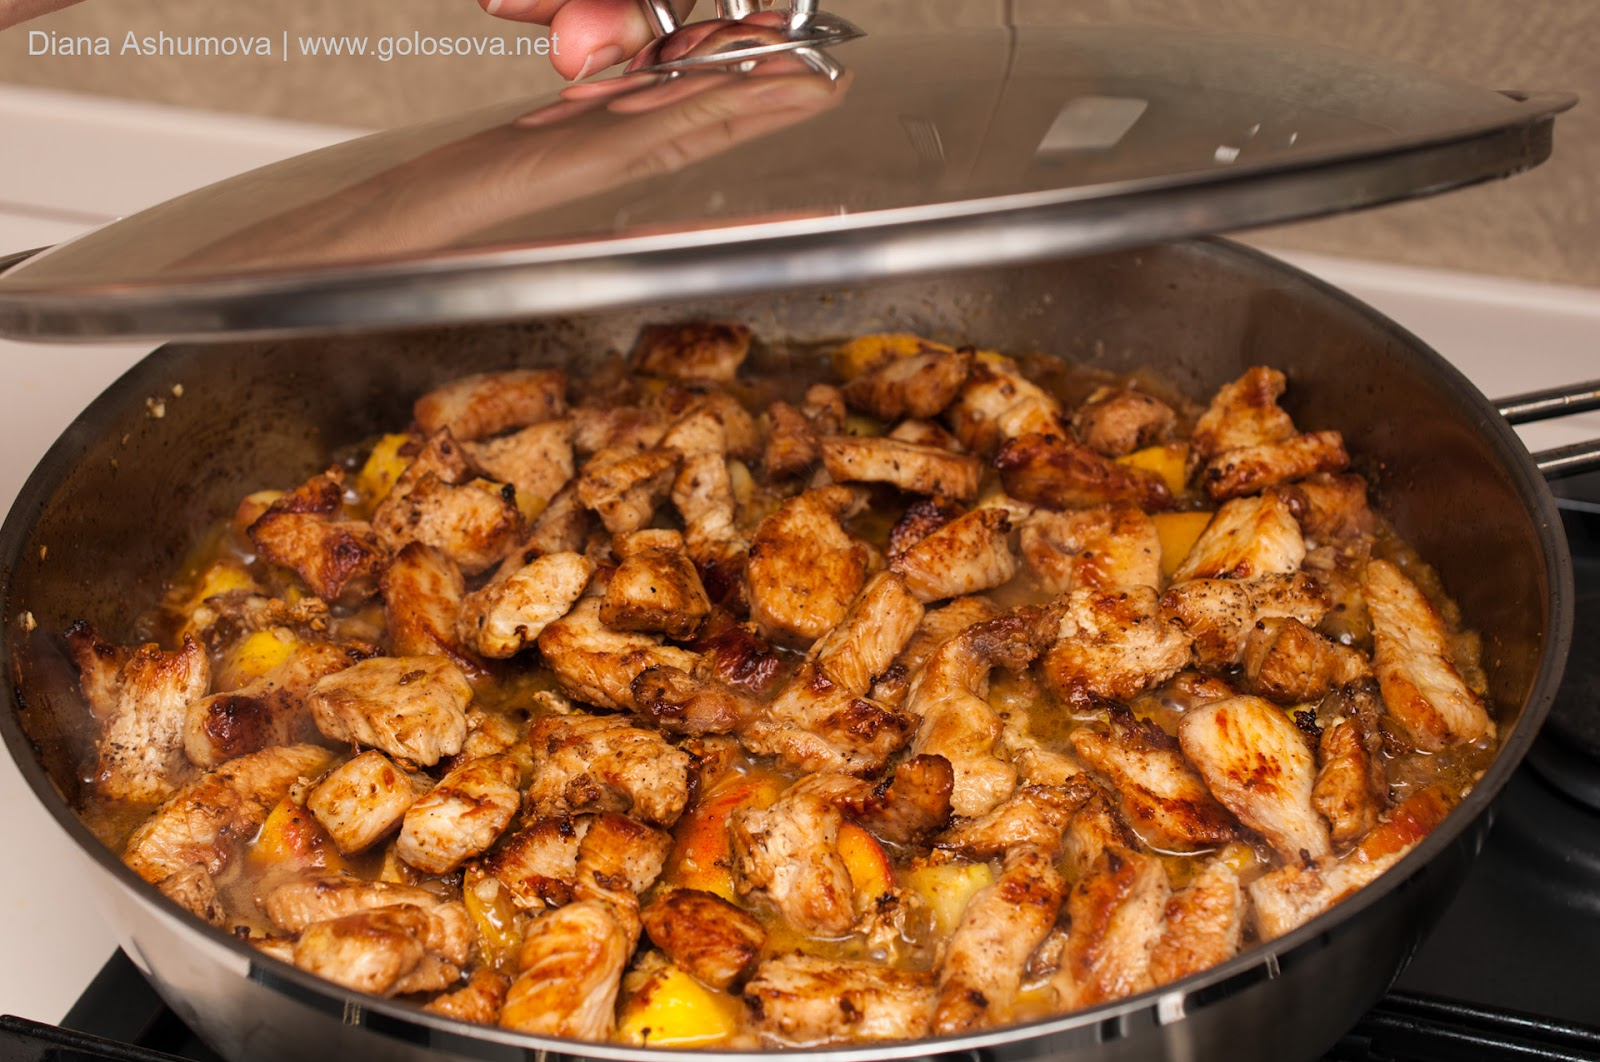 как вкусно приготовить филе индейки на сковороде